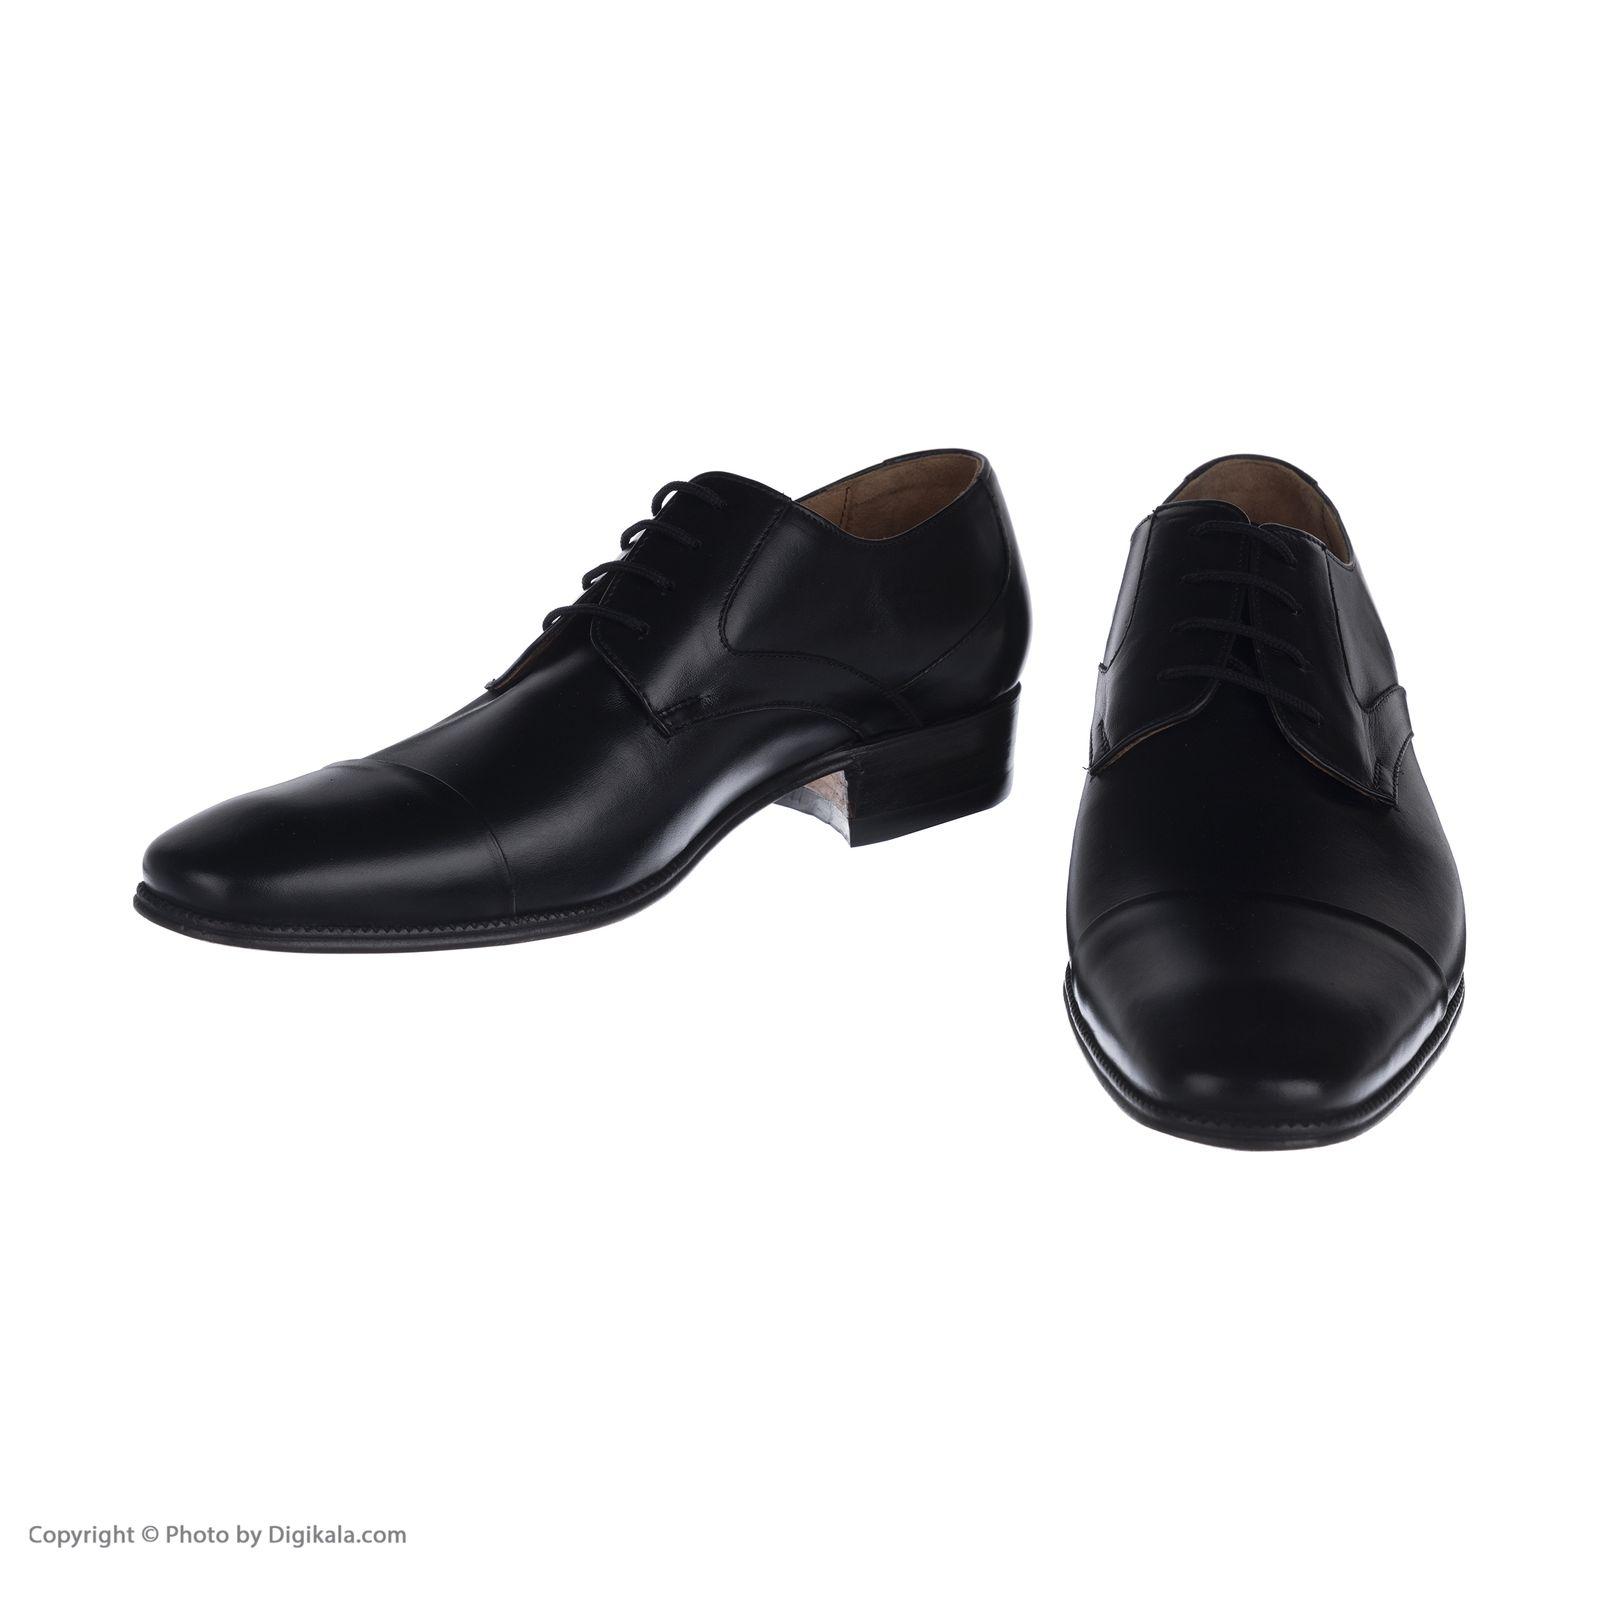 کفش مردانه نظری کد 413 -  - 4